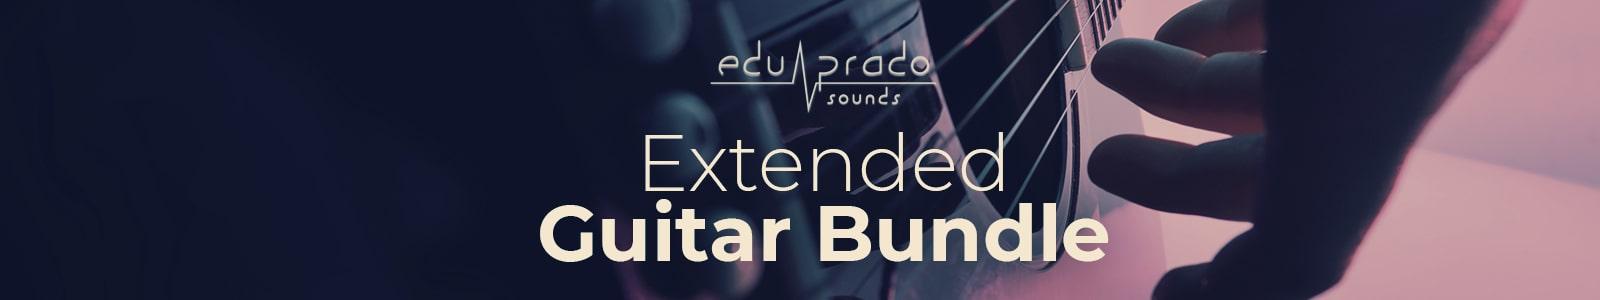 extended guitar bundle